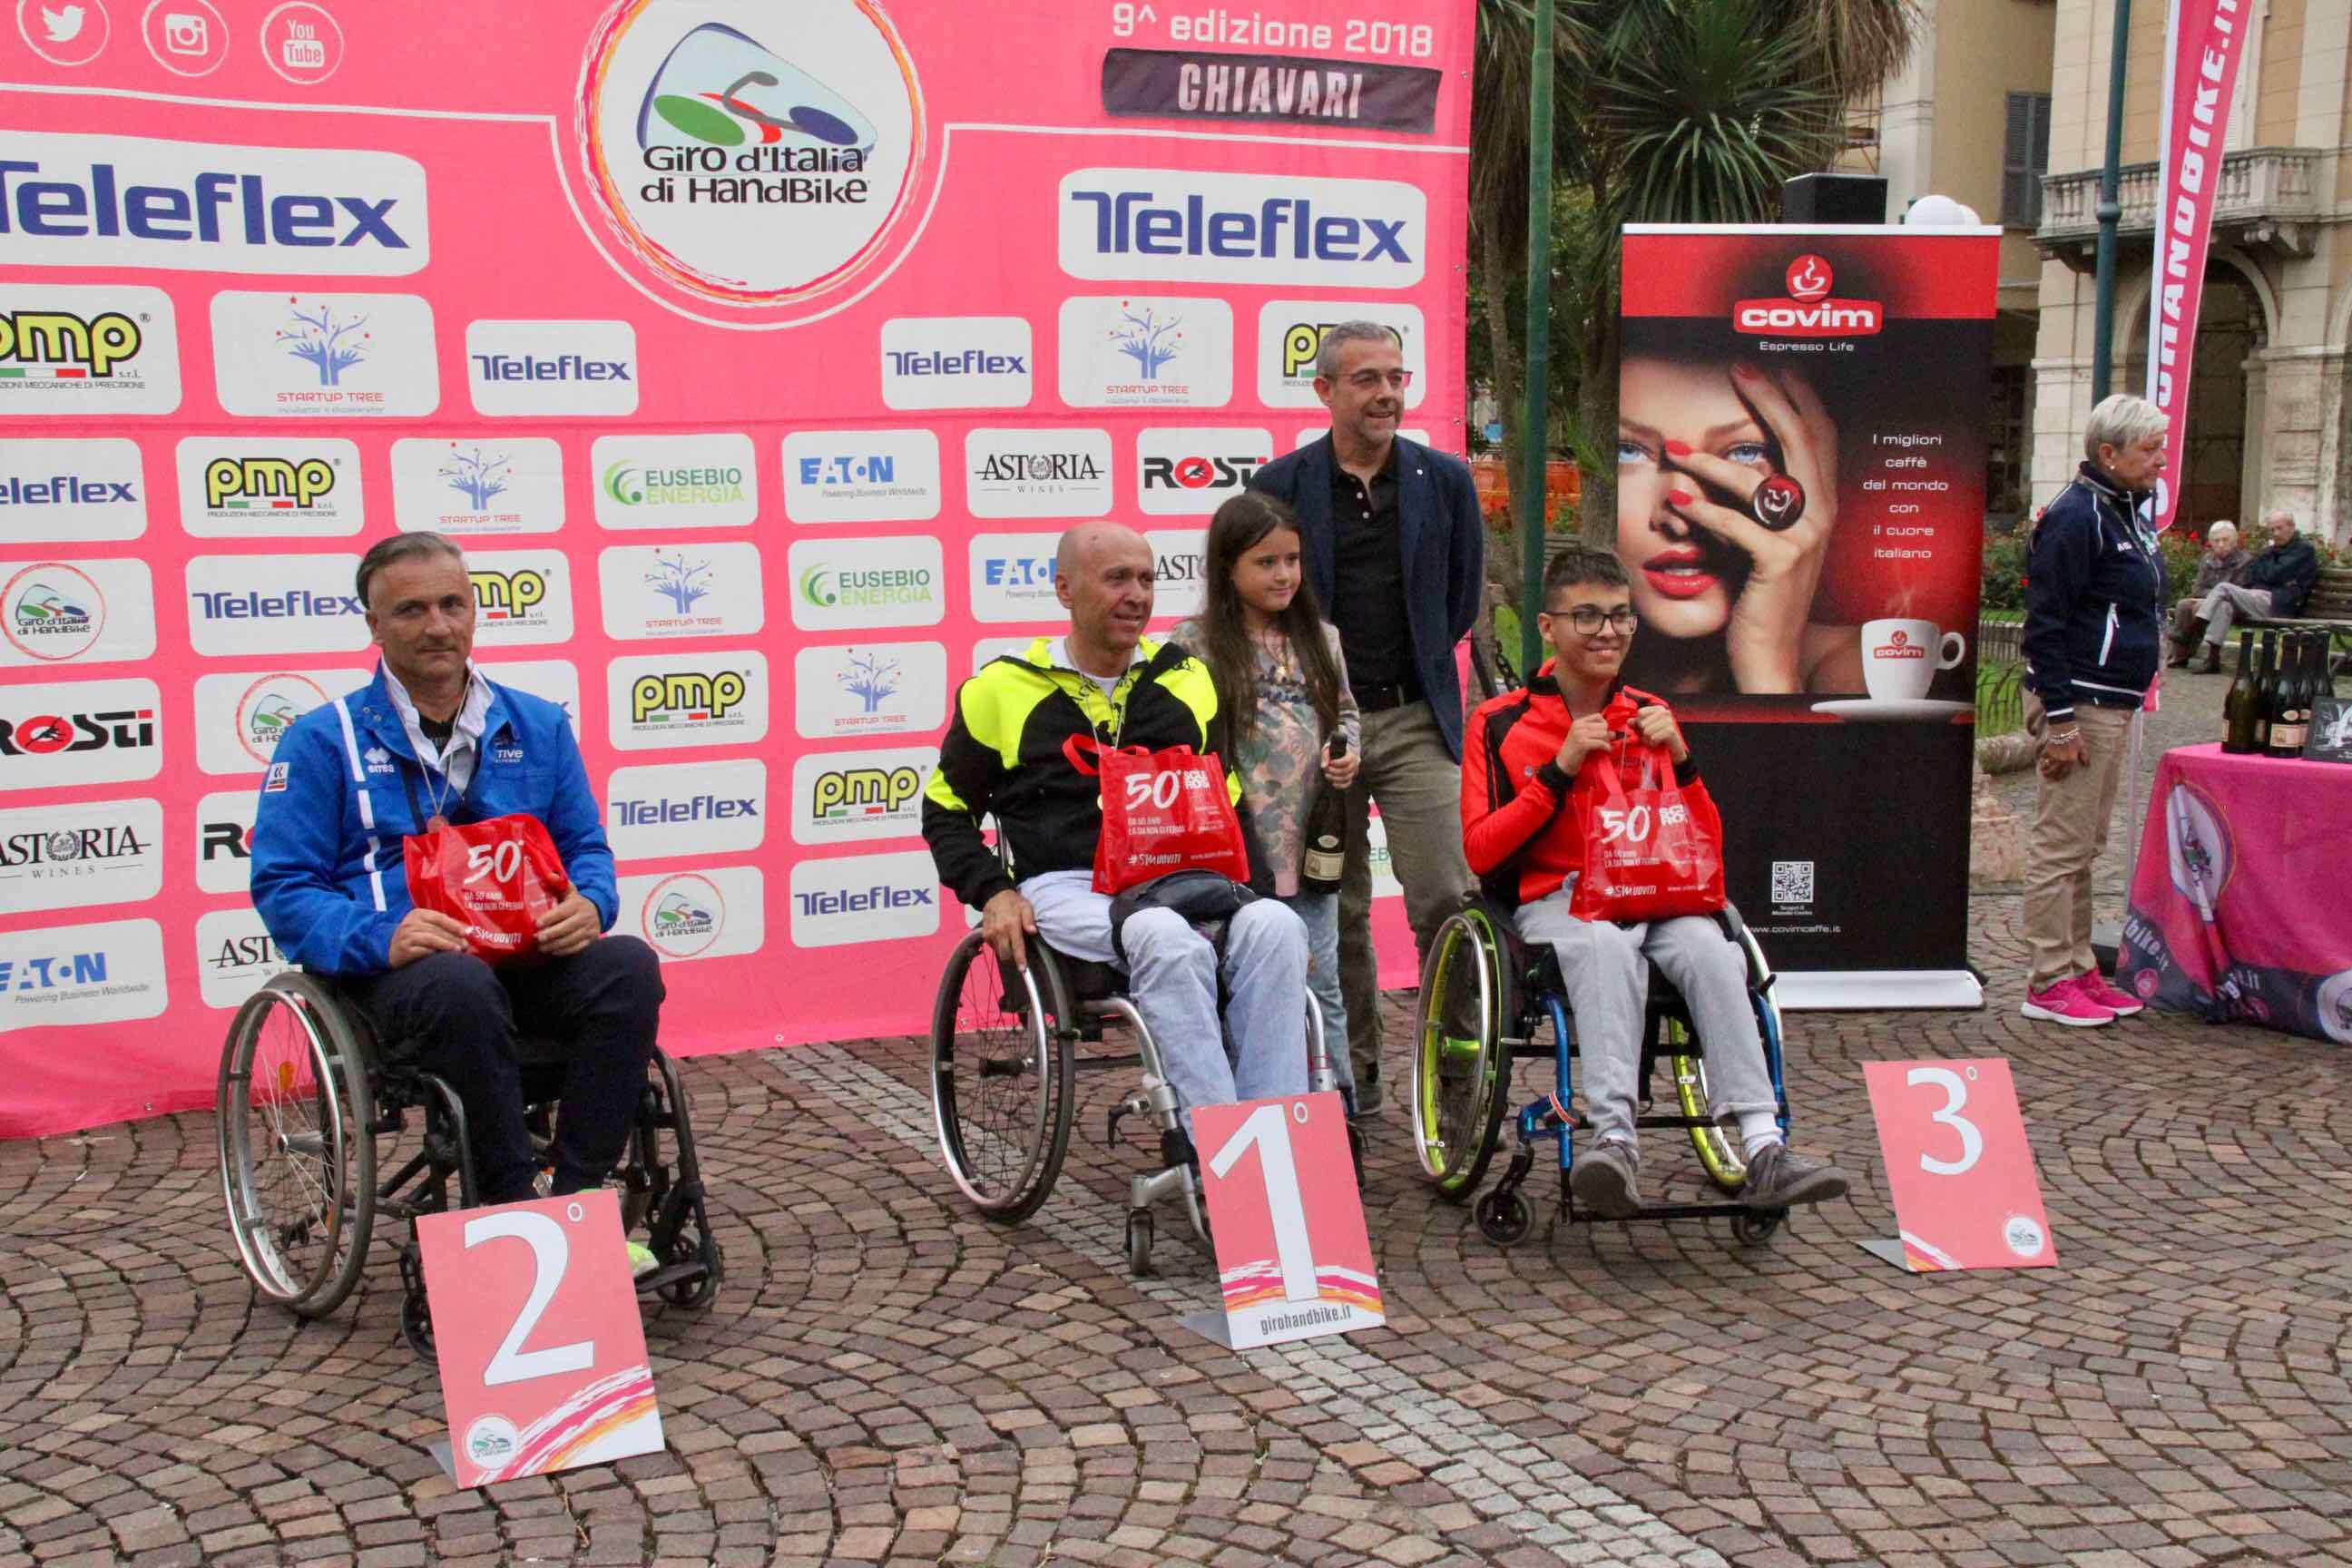 1° Memorial don Nando Negri a Chiavari per il Giro d'Italia Handbike 2018 - 20